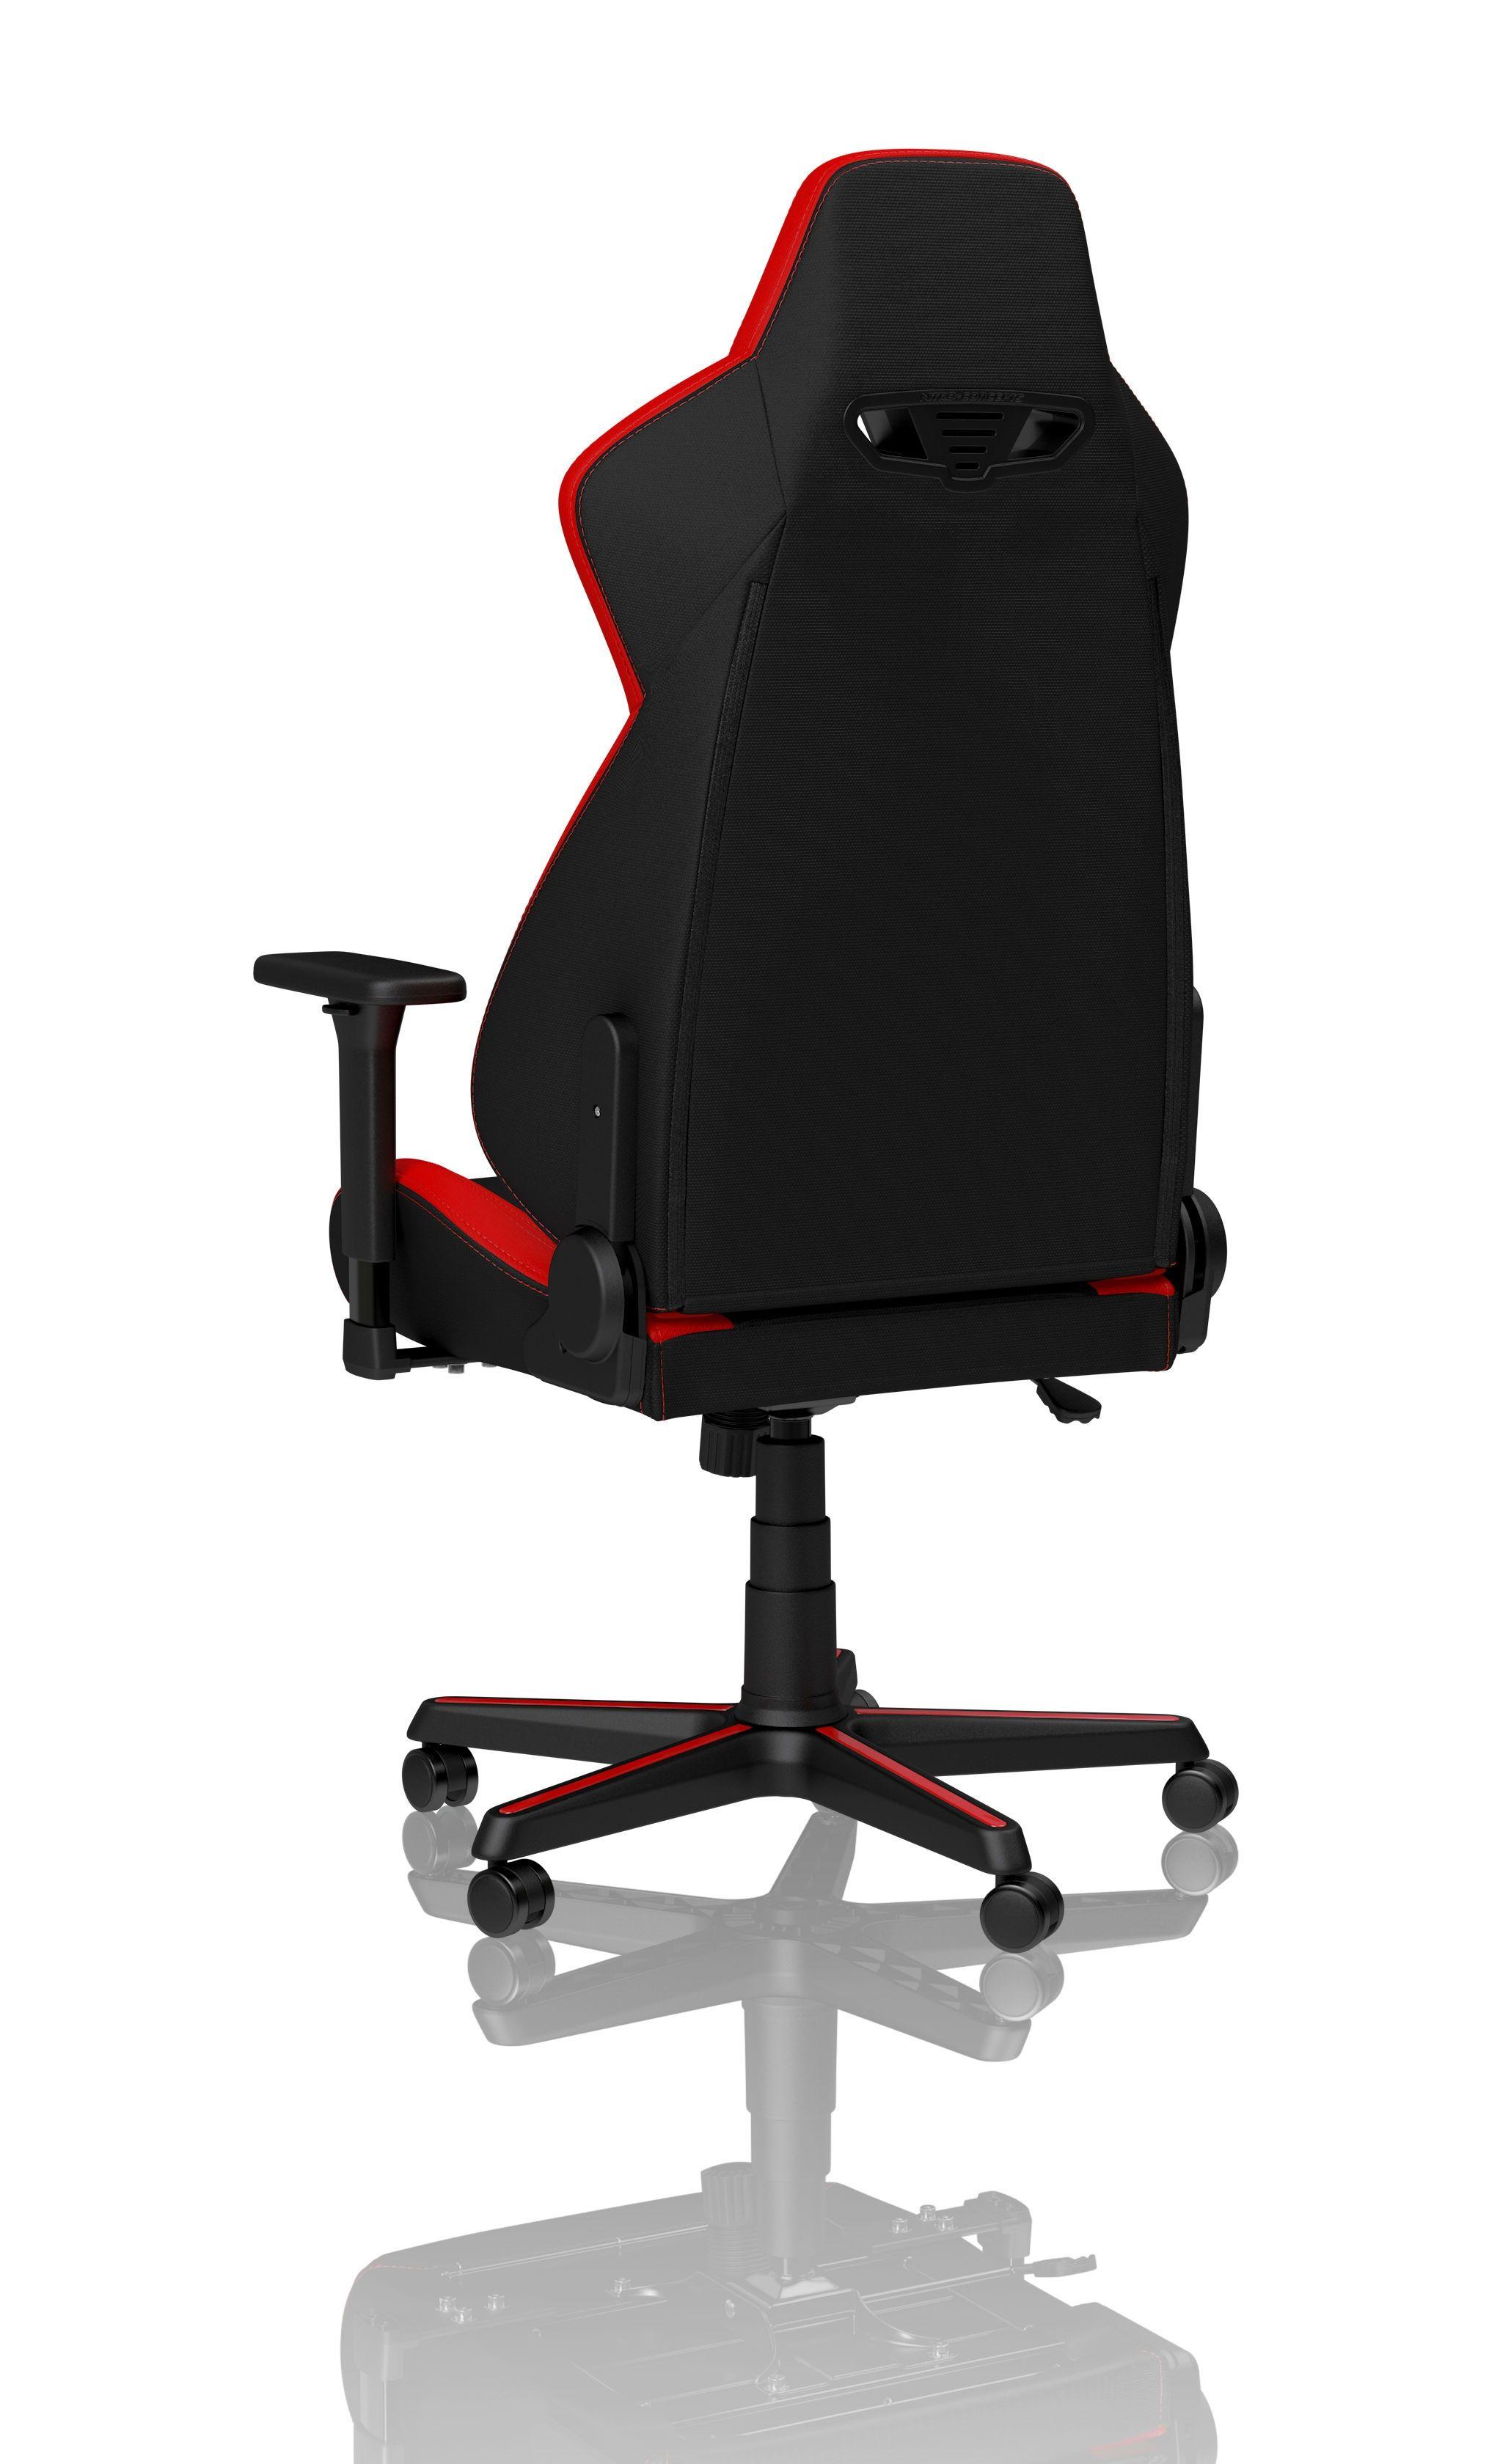 Гейминг стол Nitro Concepts - S300, inferno red - 4